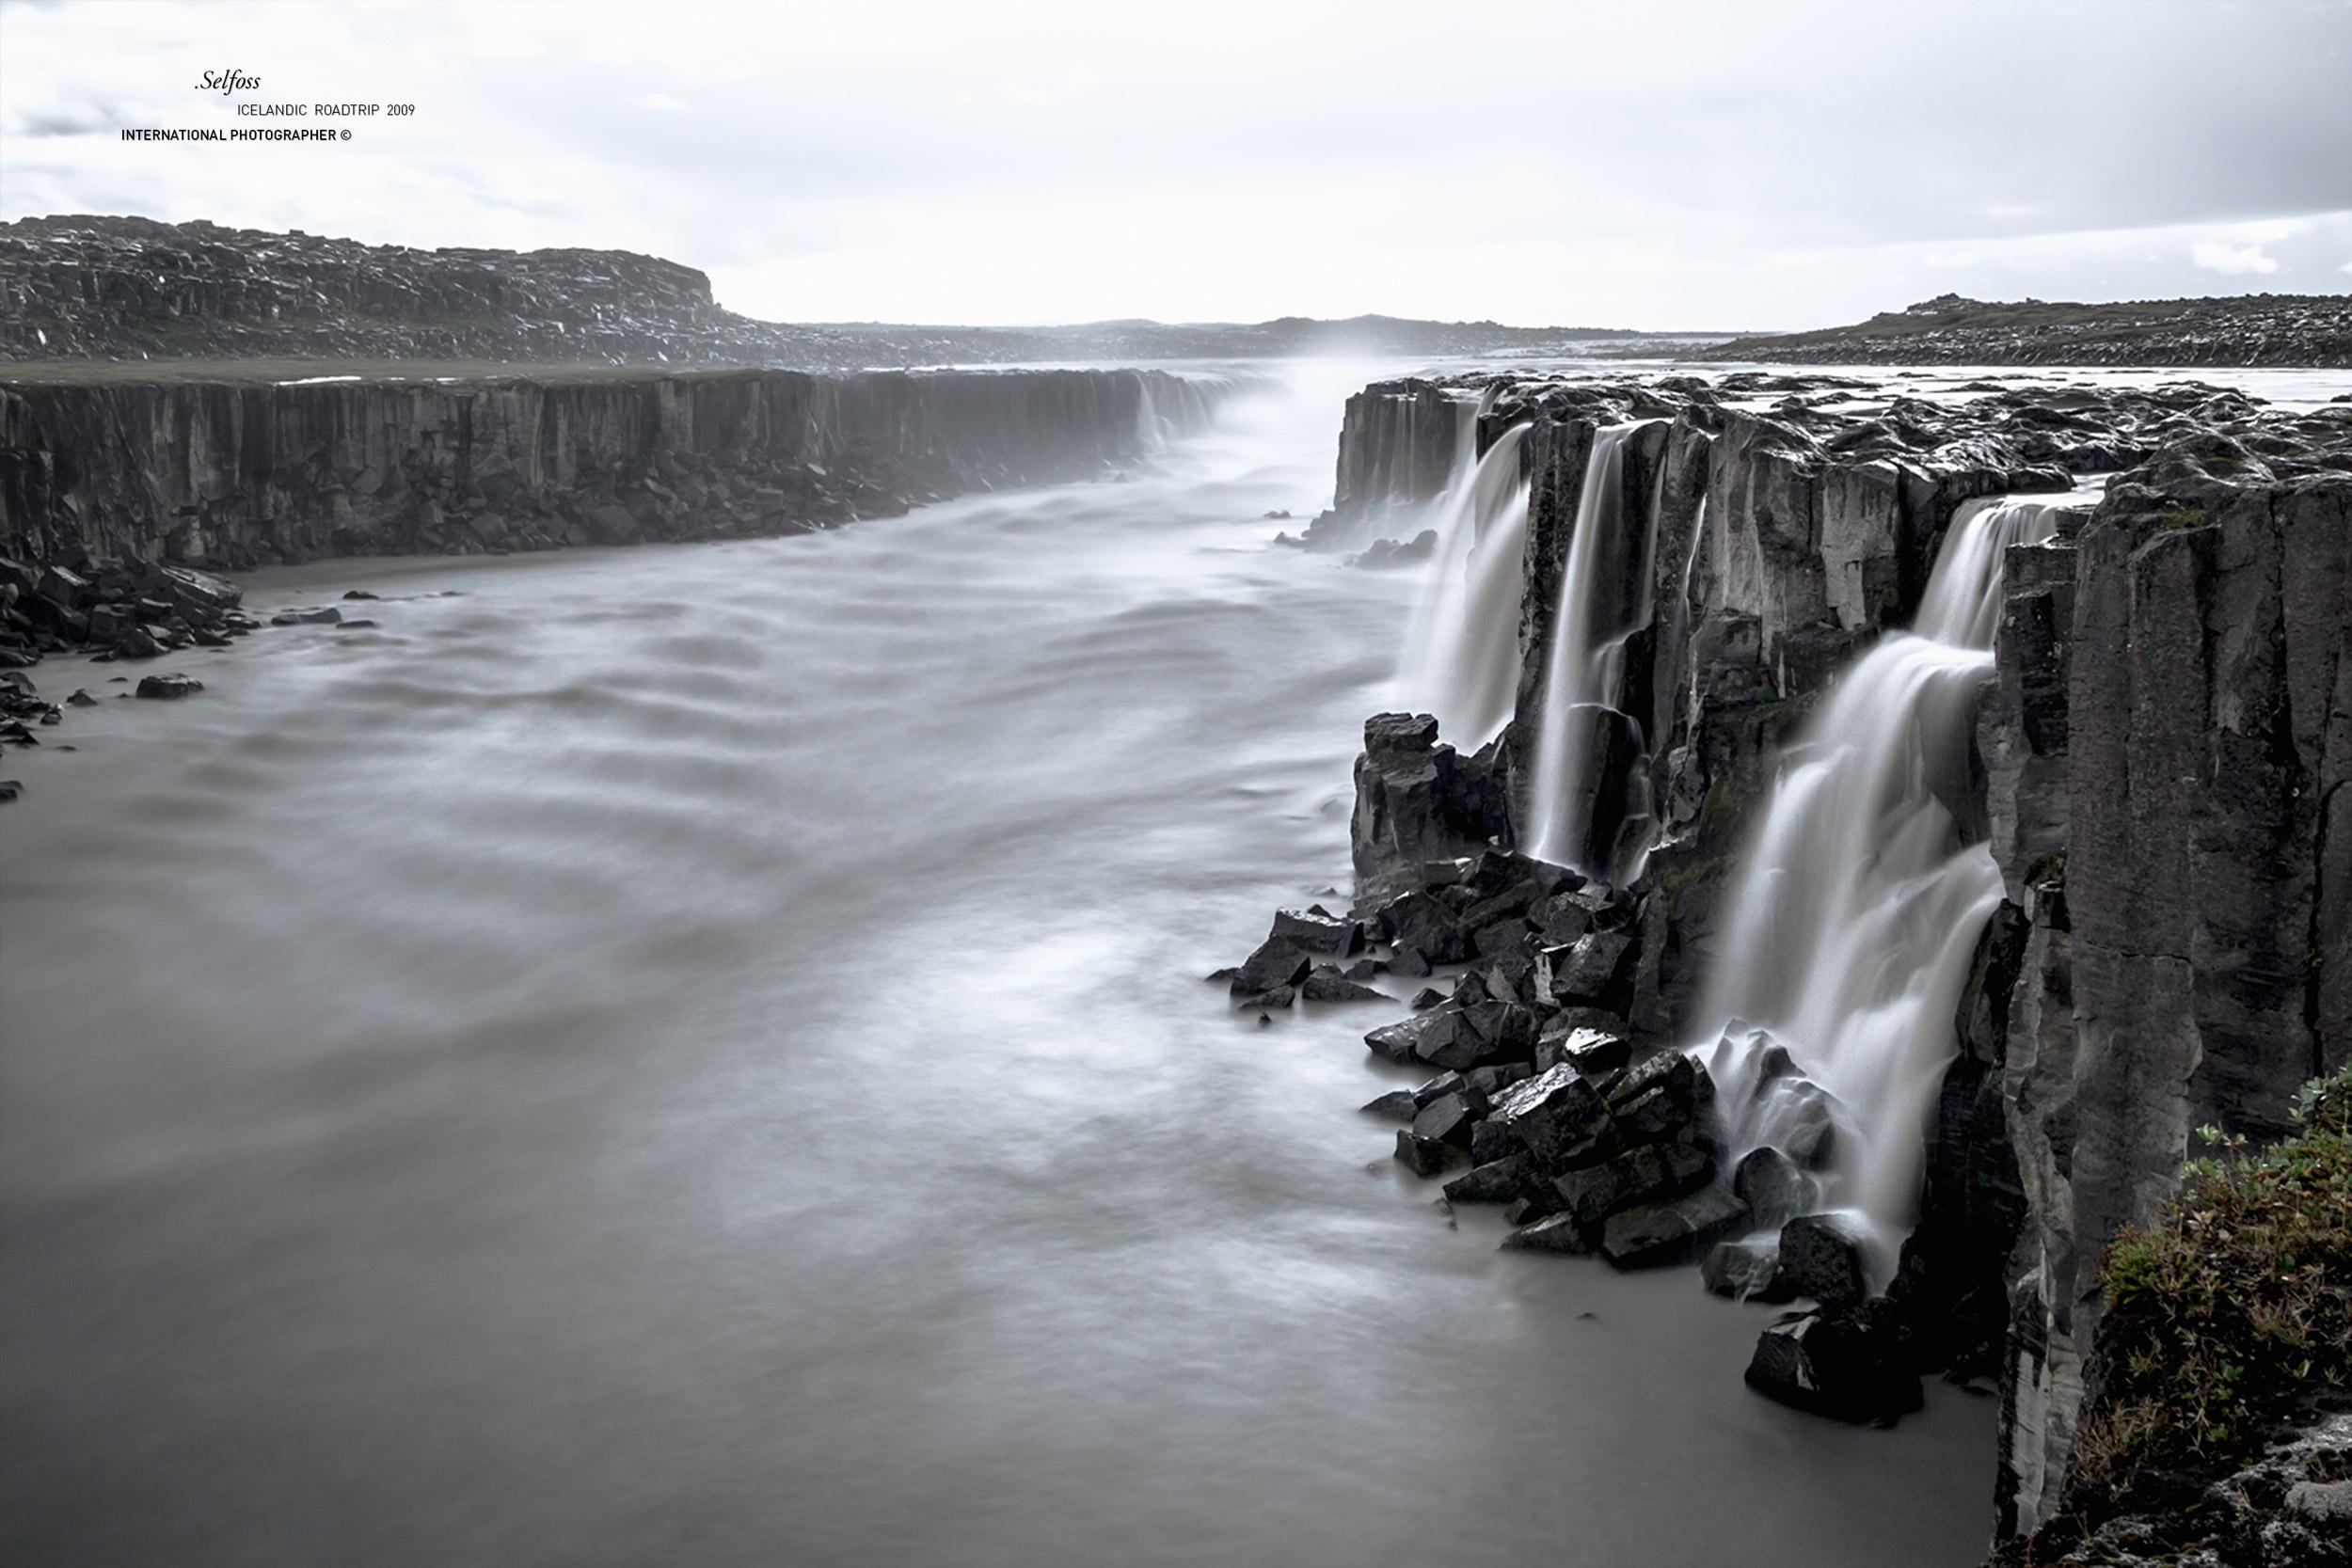 La chute Selfoss en noir et blanc